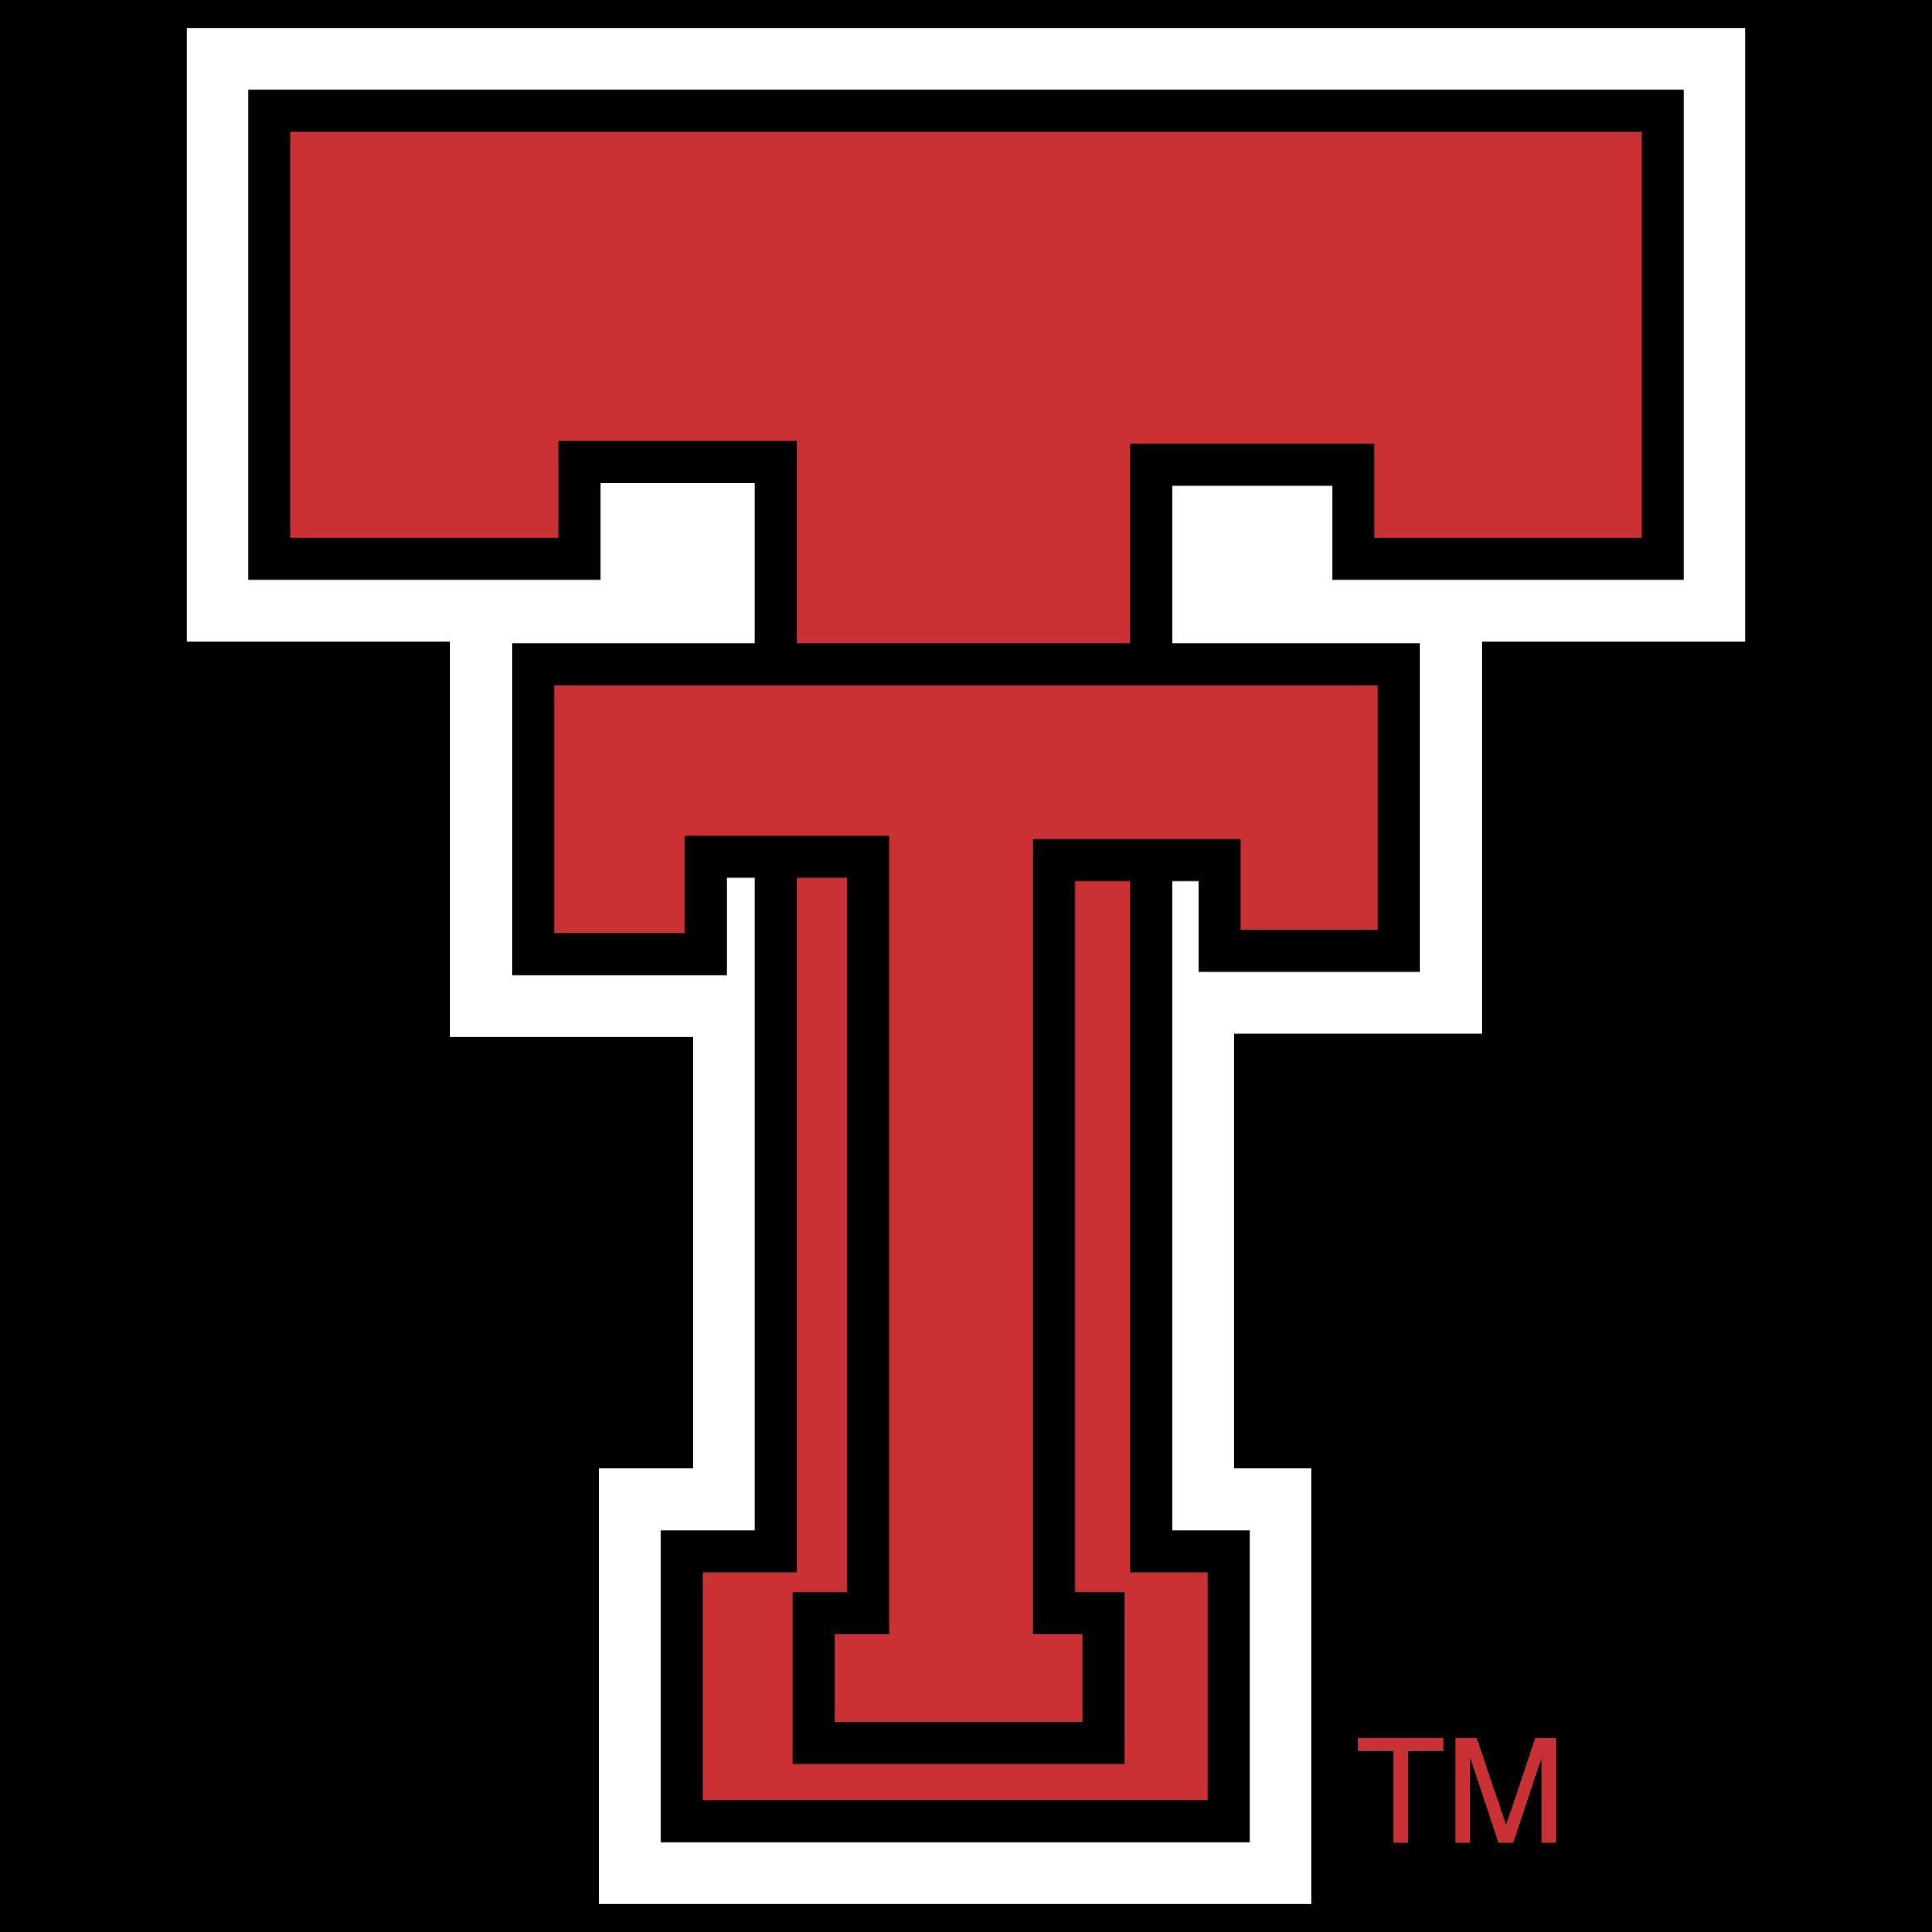 texas tech red raiders logo png transparent svg vector freebie rh freebiesupply com texas tech logo stencil texas tech logos pictures